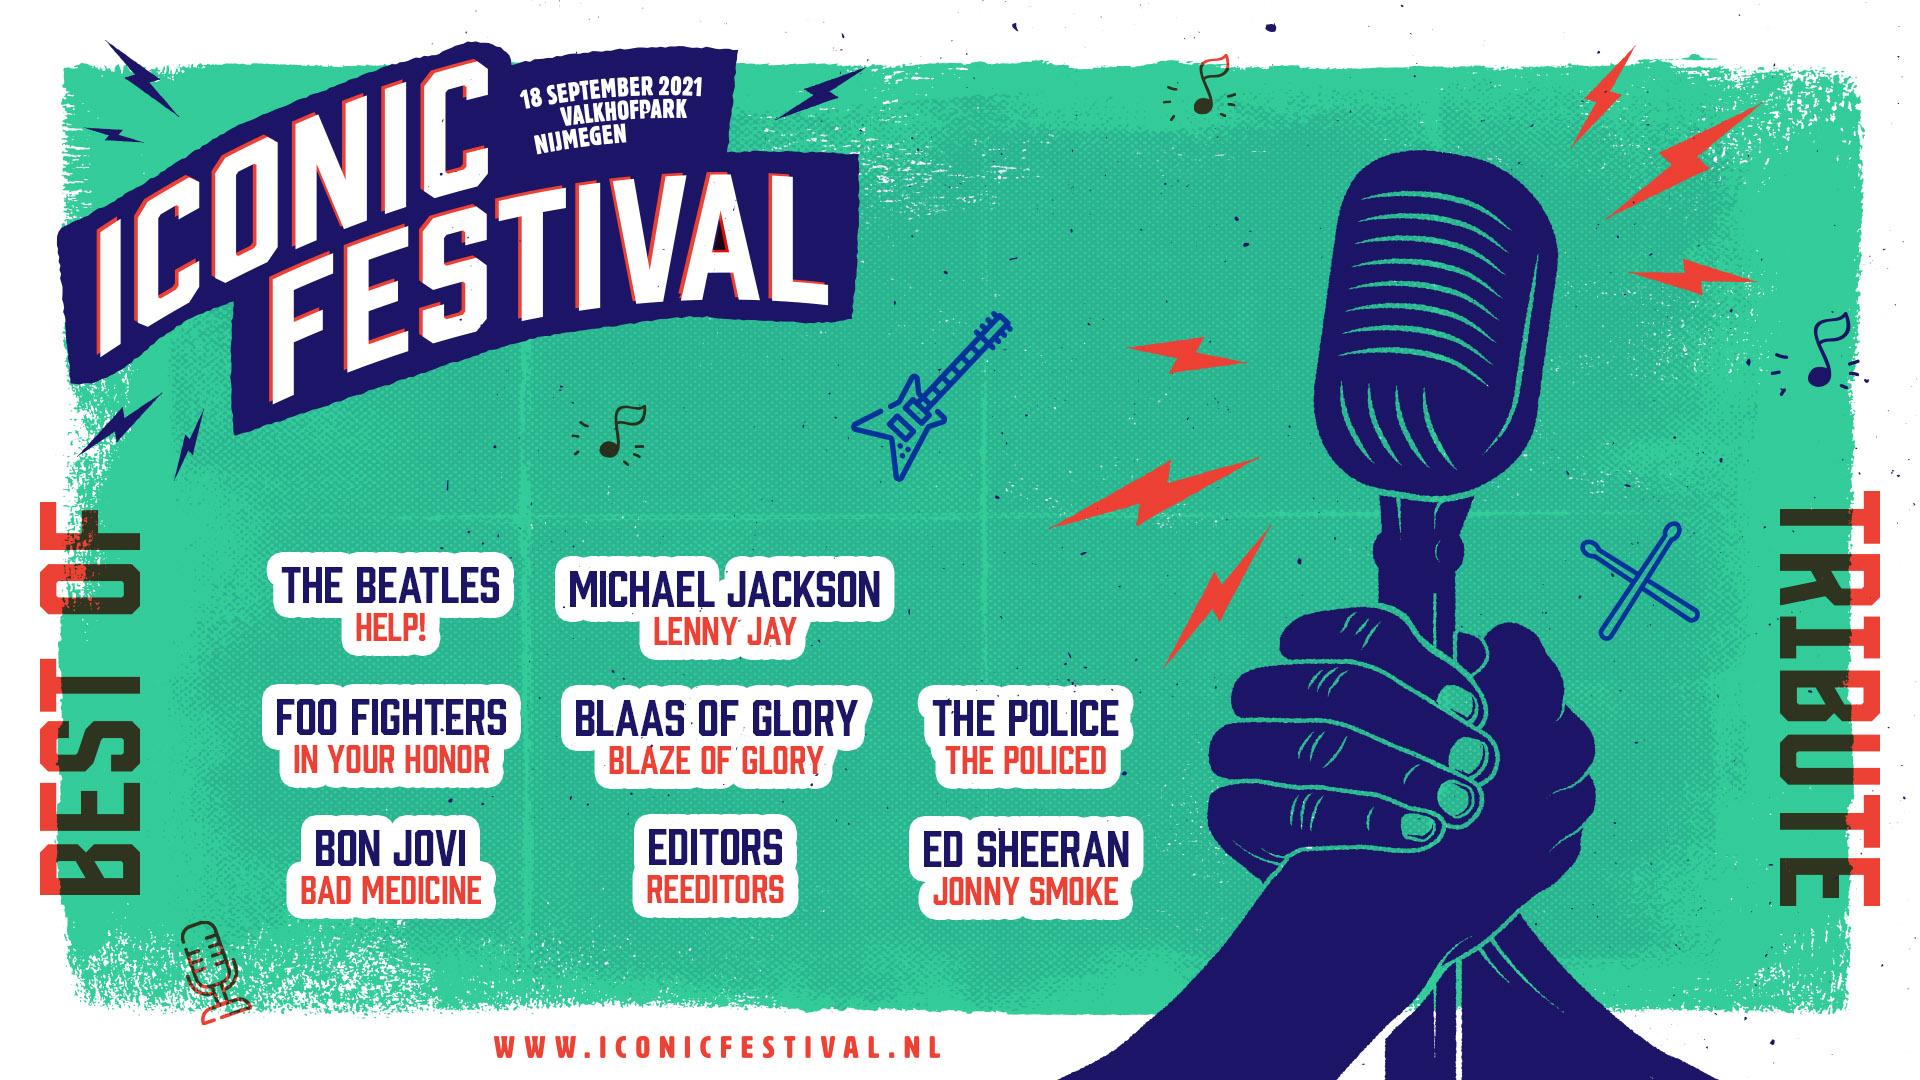 https://iconicfestival.nl/wp-content/uploads/2021/06/IconicFestisval_programma-poster_2021.jpg